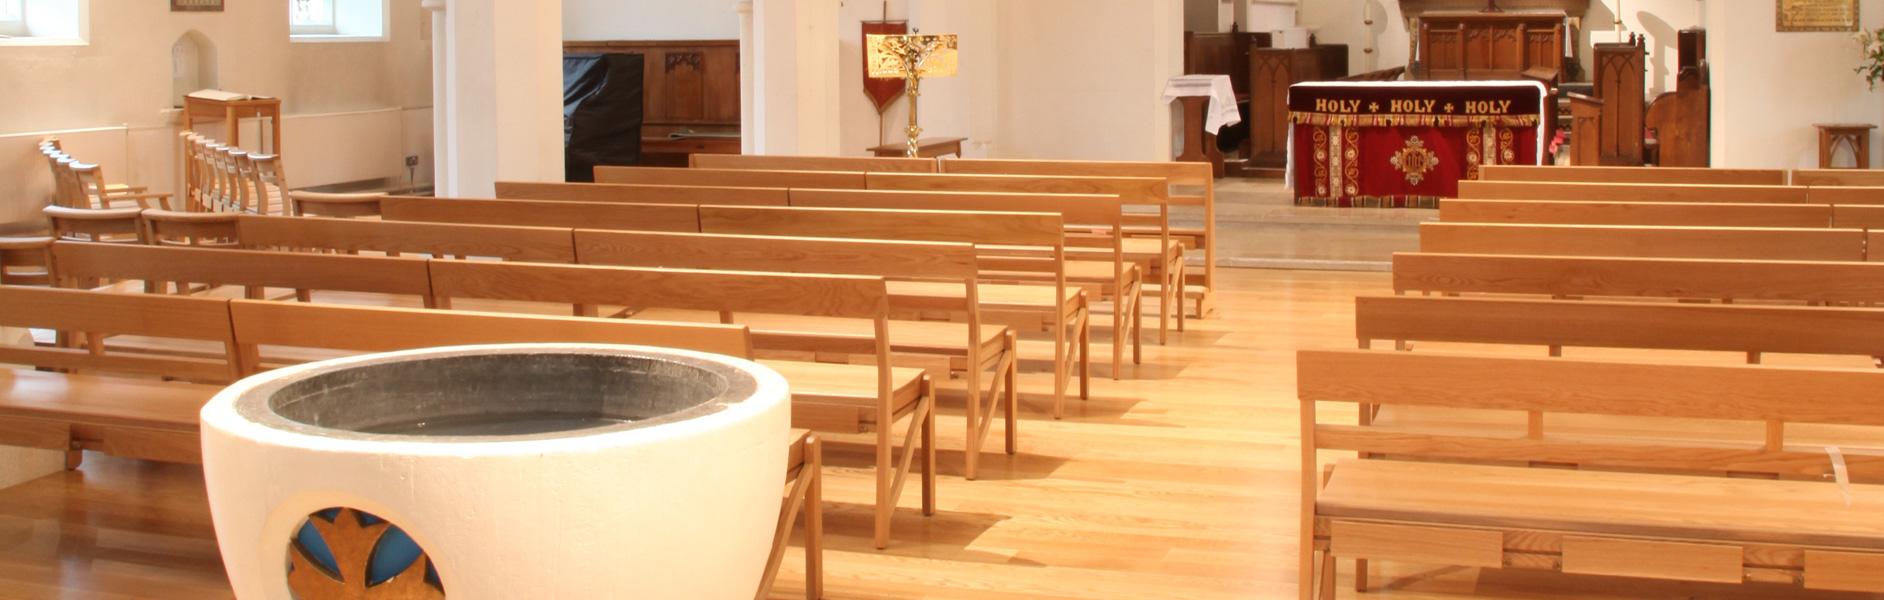 ICS pews designed for St. John's Church, Farncombe